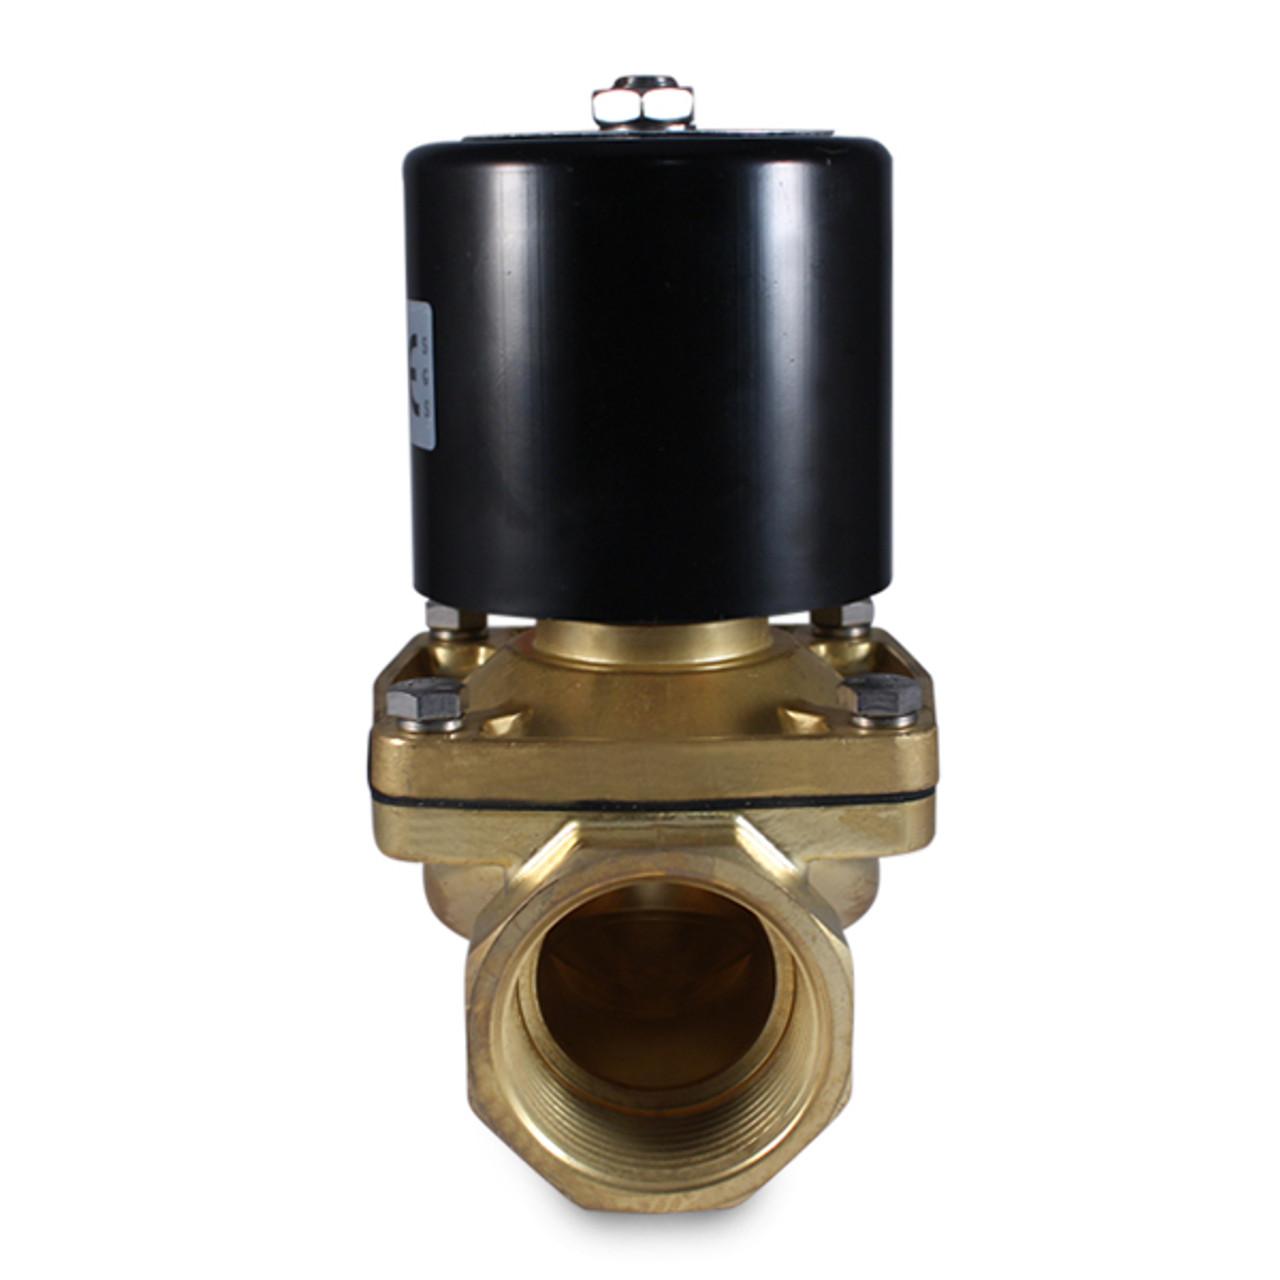 1-1//4 N.C Diesel Fuel 110V AC Electric Brass Solenoid Valve for Water Gas Air